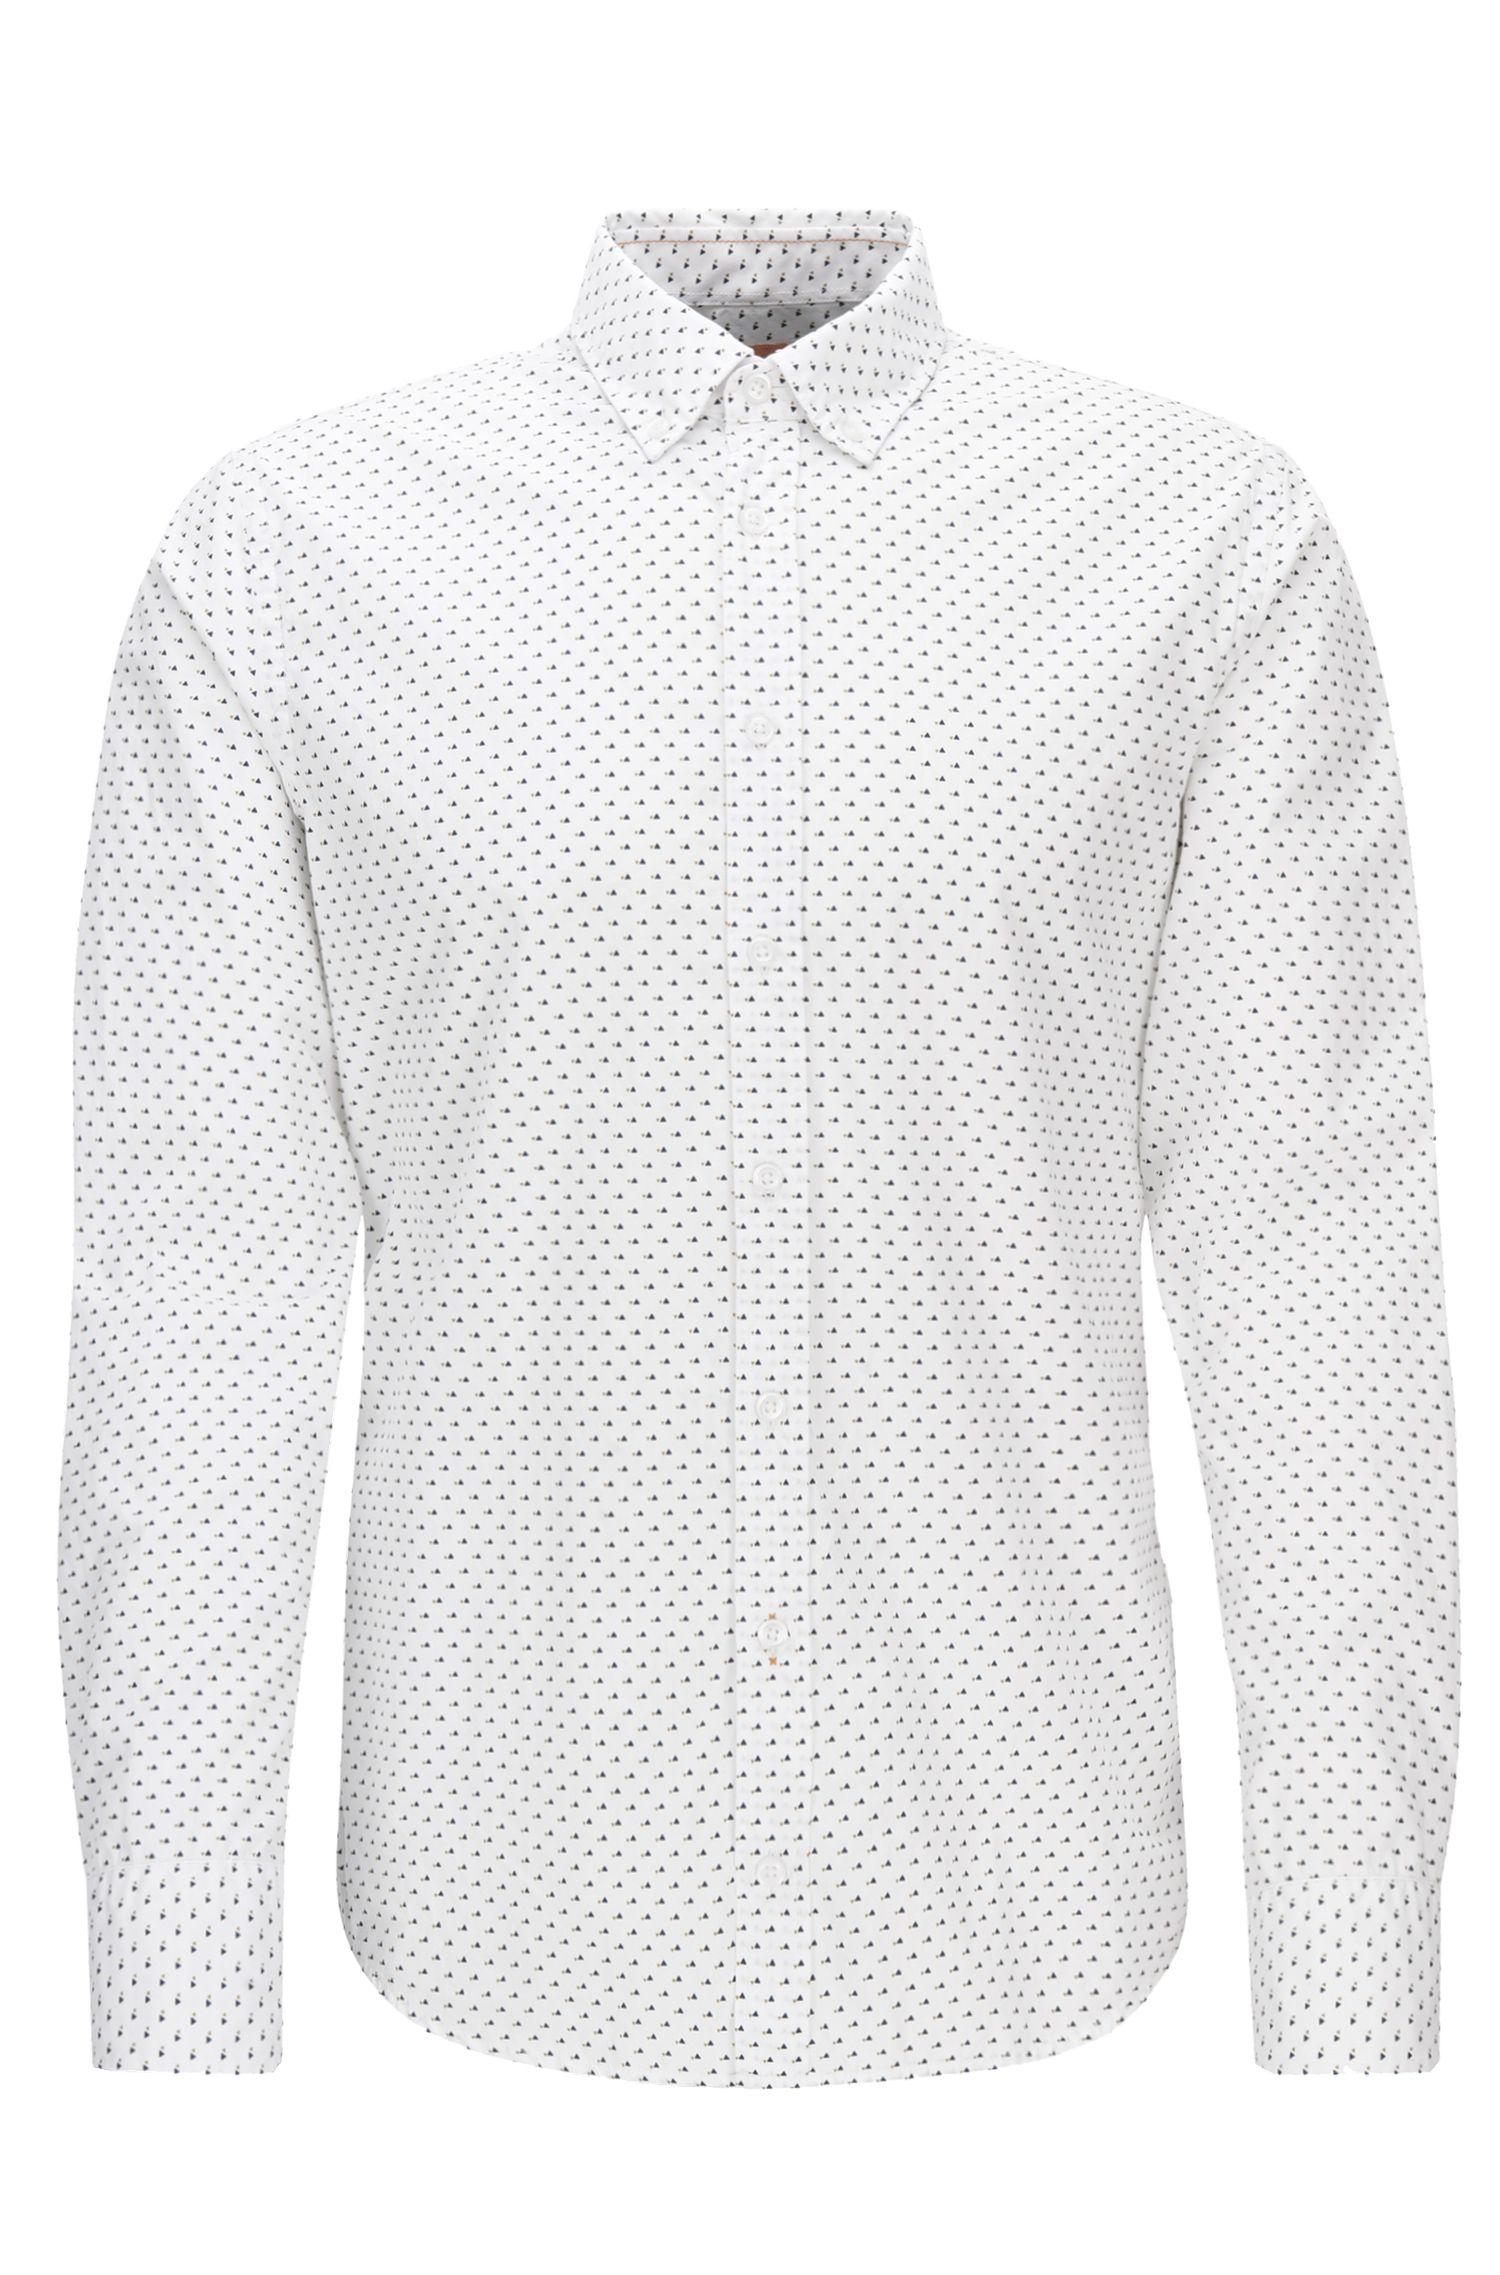 'Epreppy'   Slim Fit, Geometric Cotton Button Down Shirt